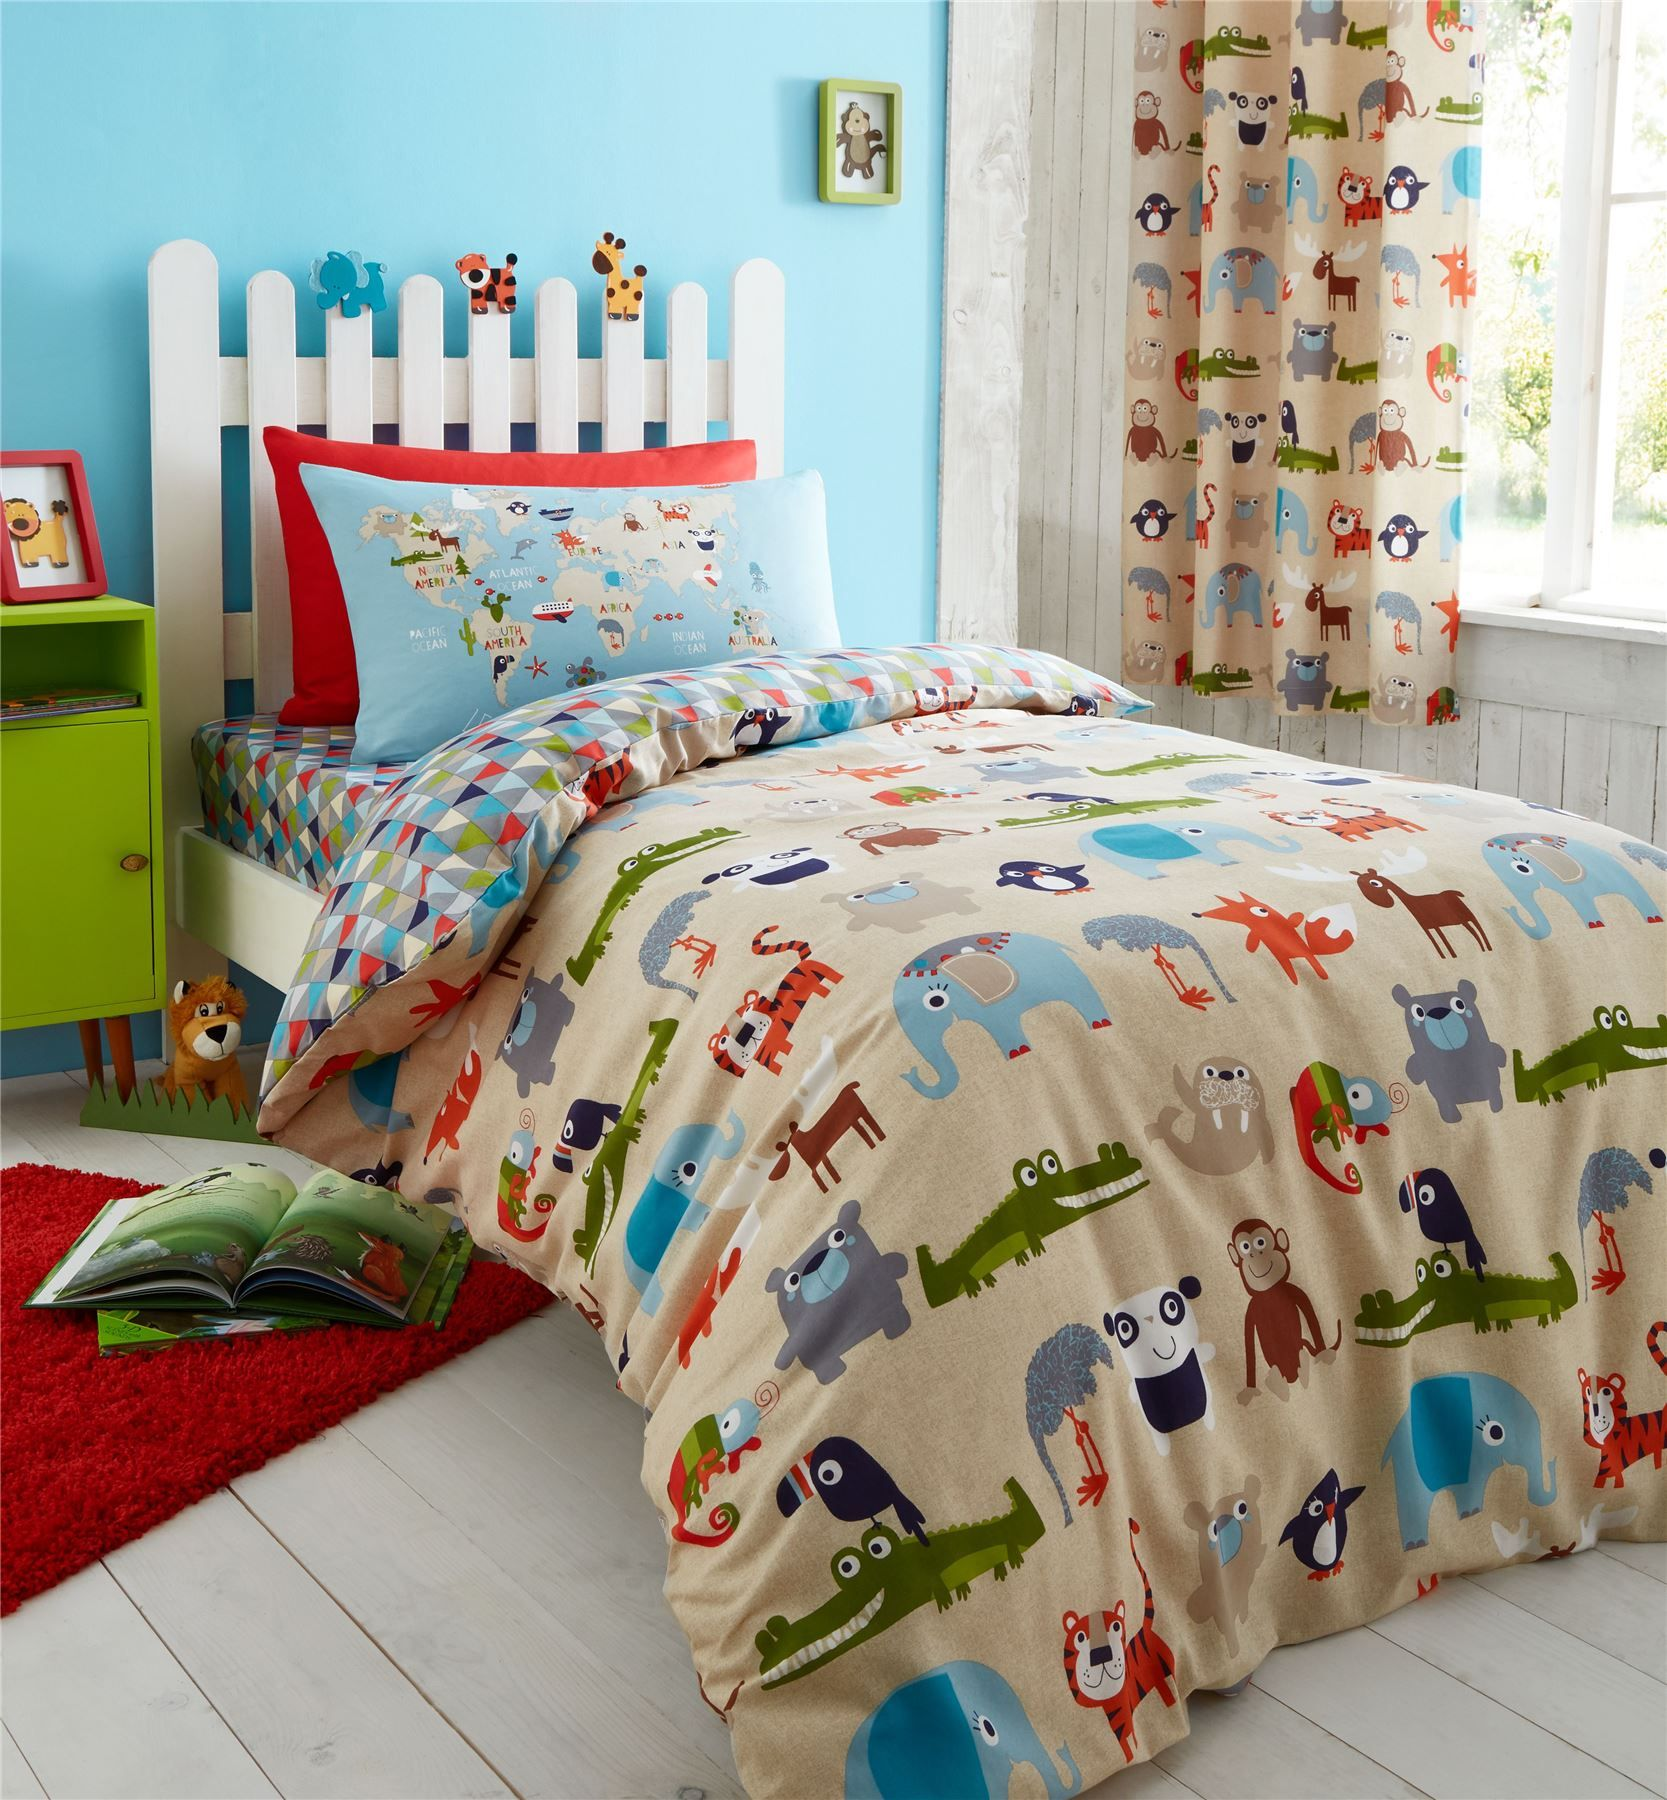 Zoo Safari Animals Kids Bedding Twin or Full Duvet Cover